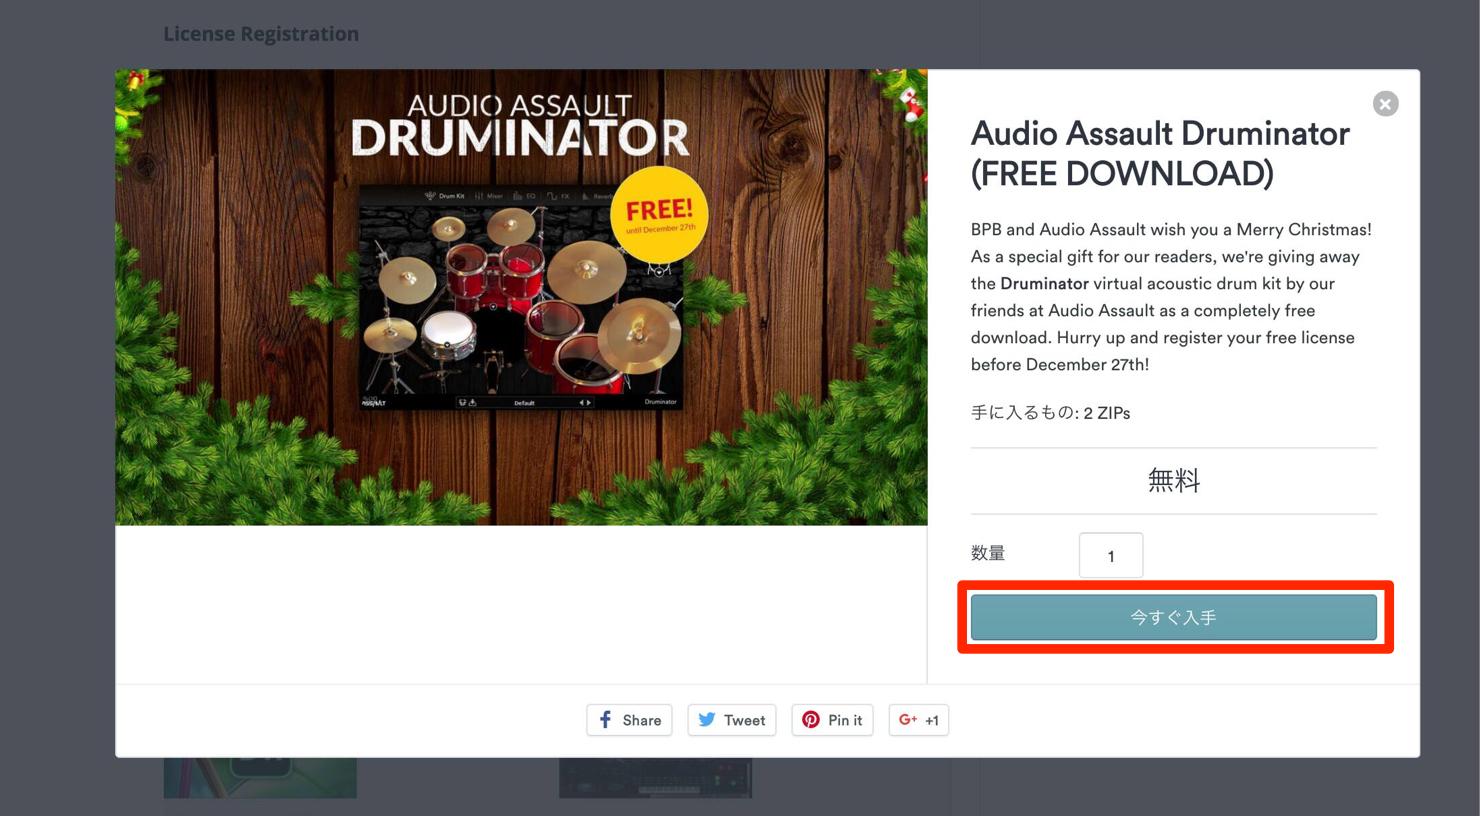 BPB-AUDIO-ASSAULT-DRUMINATOR-FREE-download-2